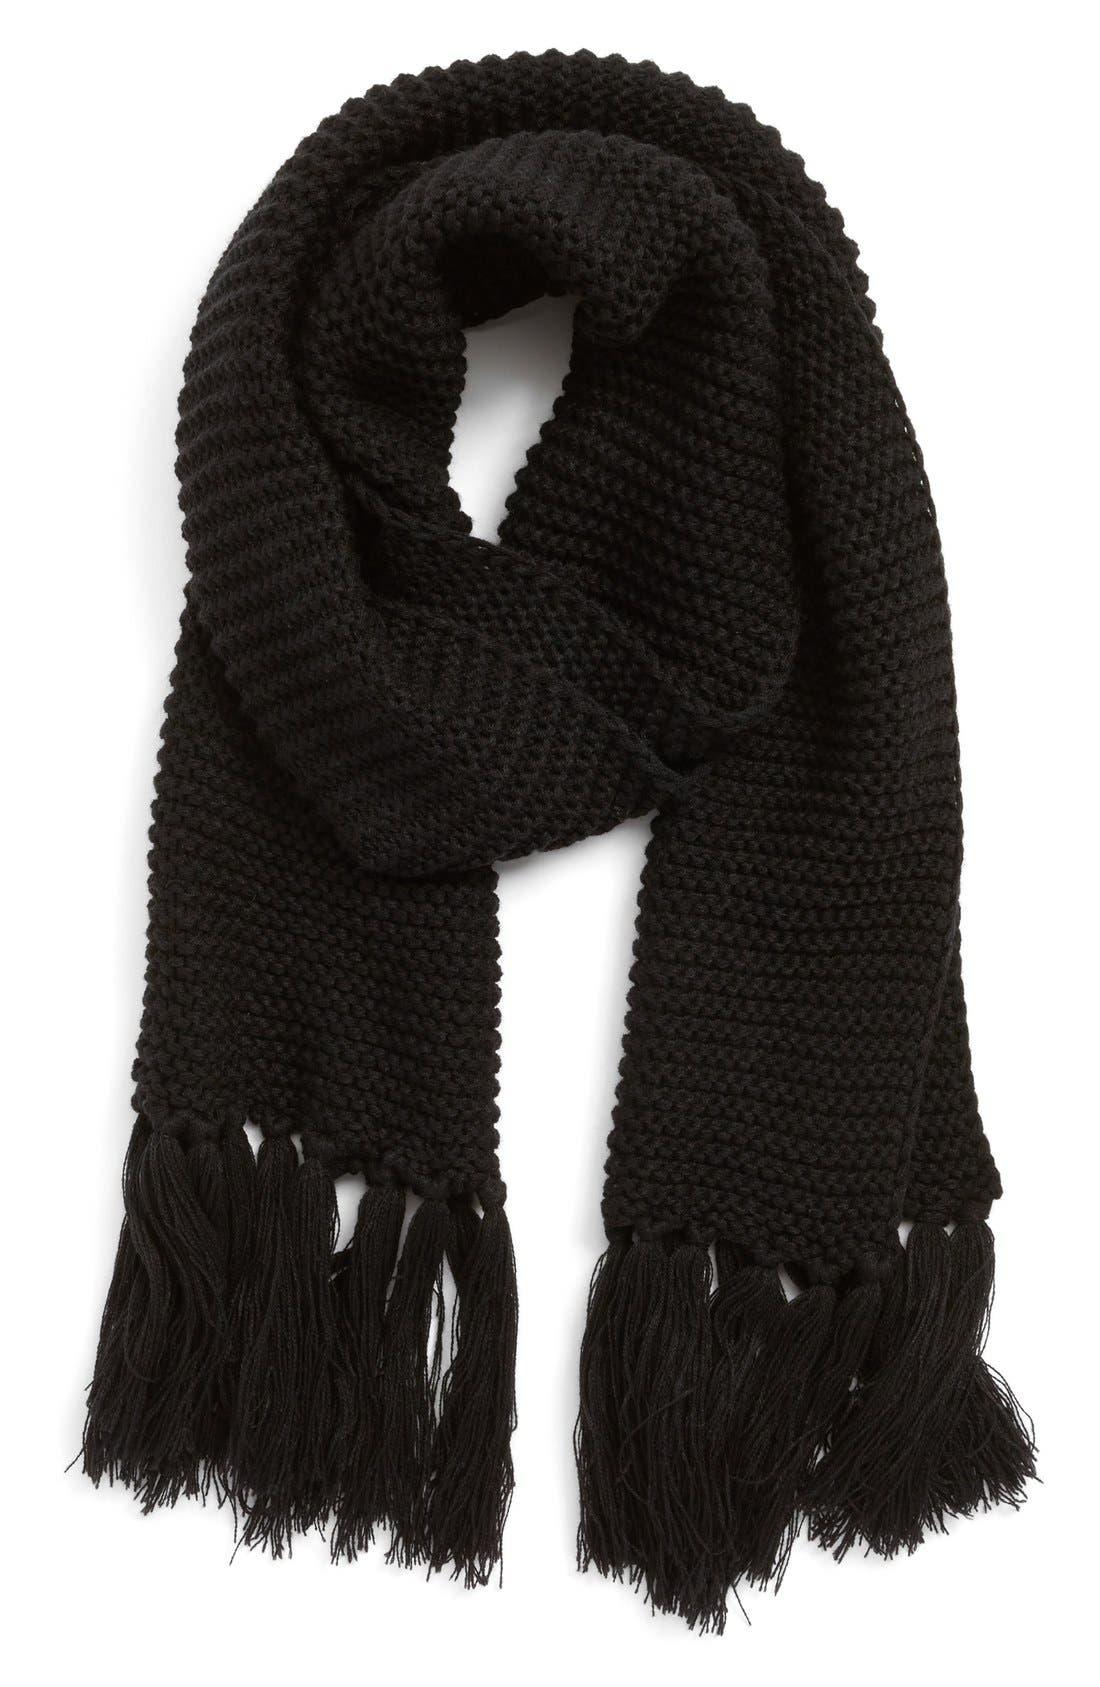 Alternate Image 1 Selected - Modena Chunky Knit Scarf